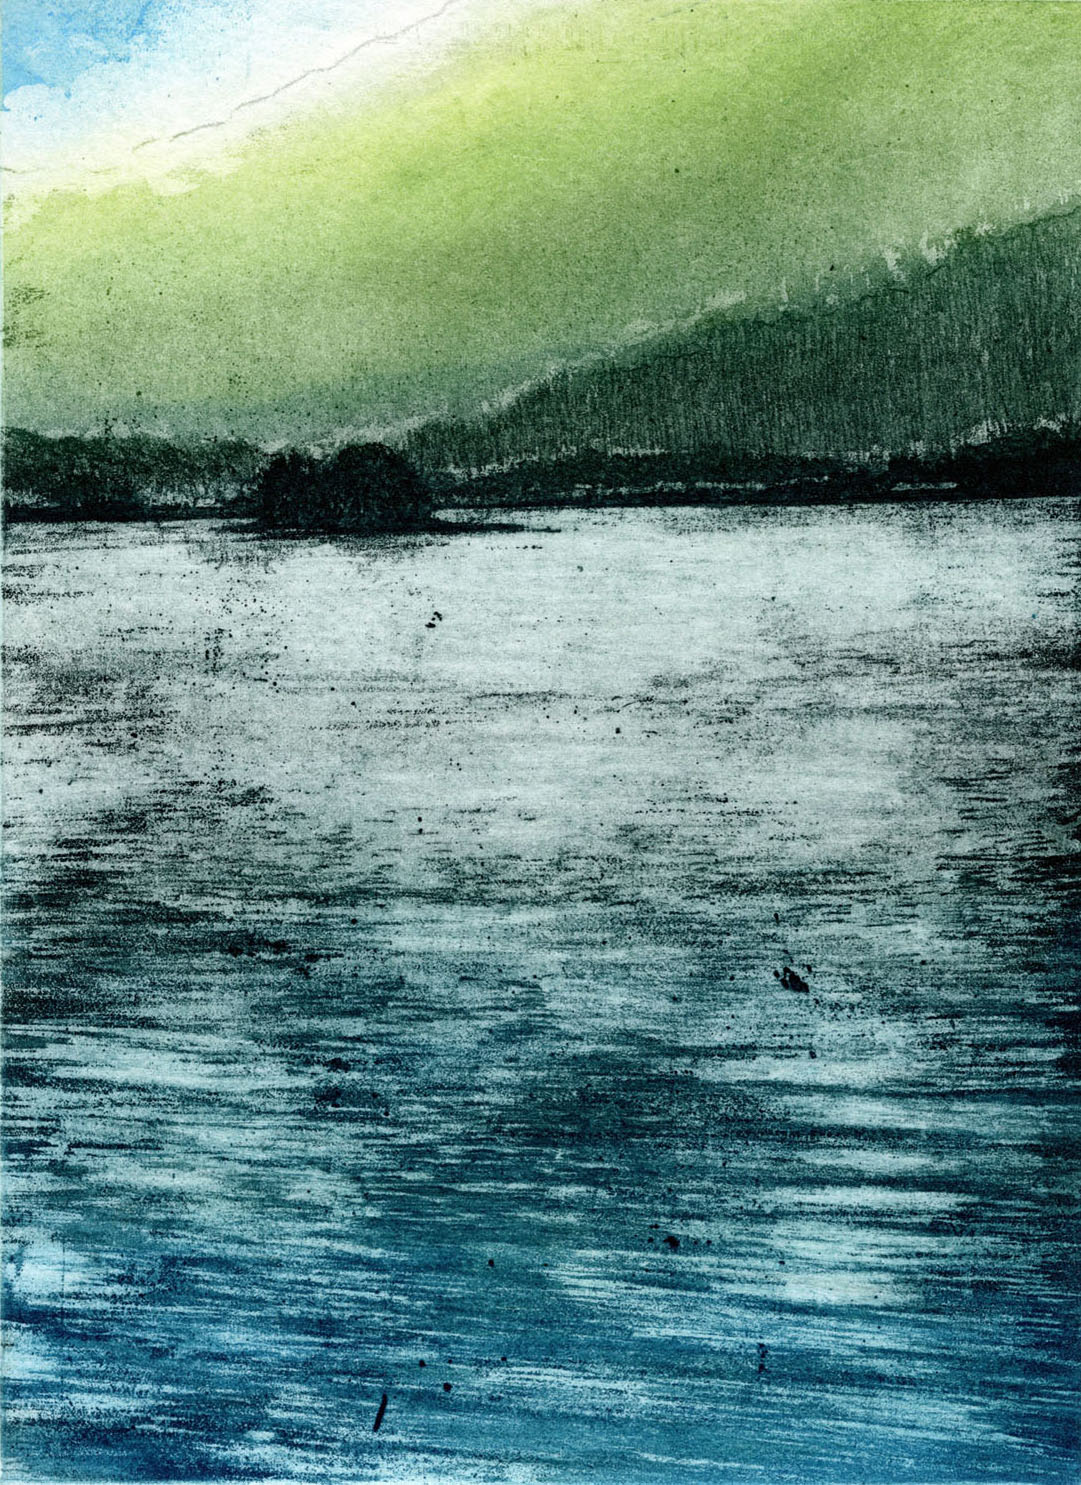 Ian McNicol. Loch